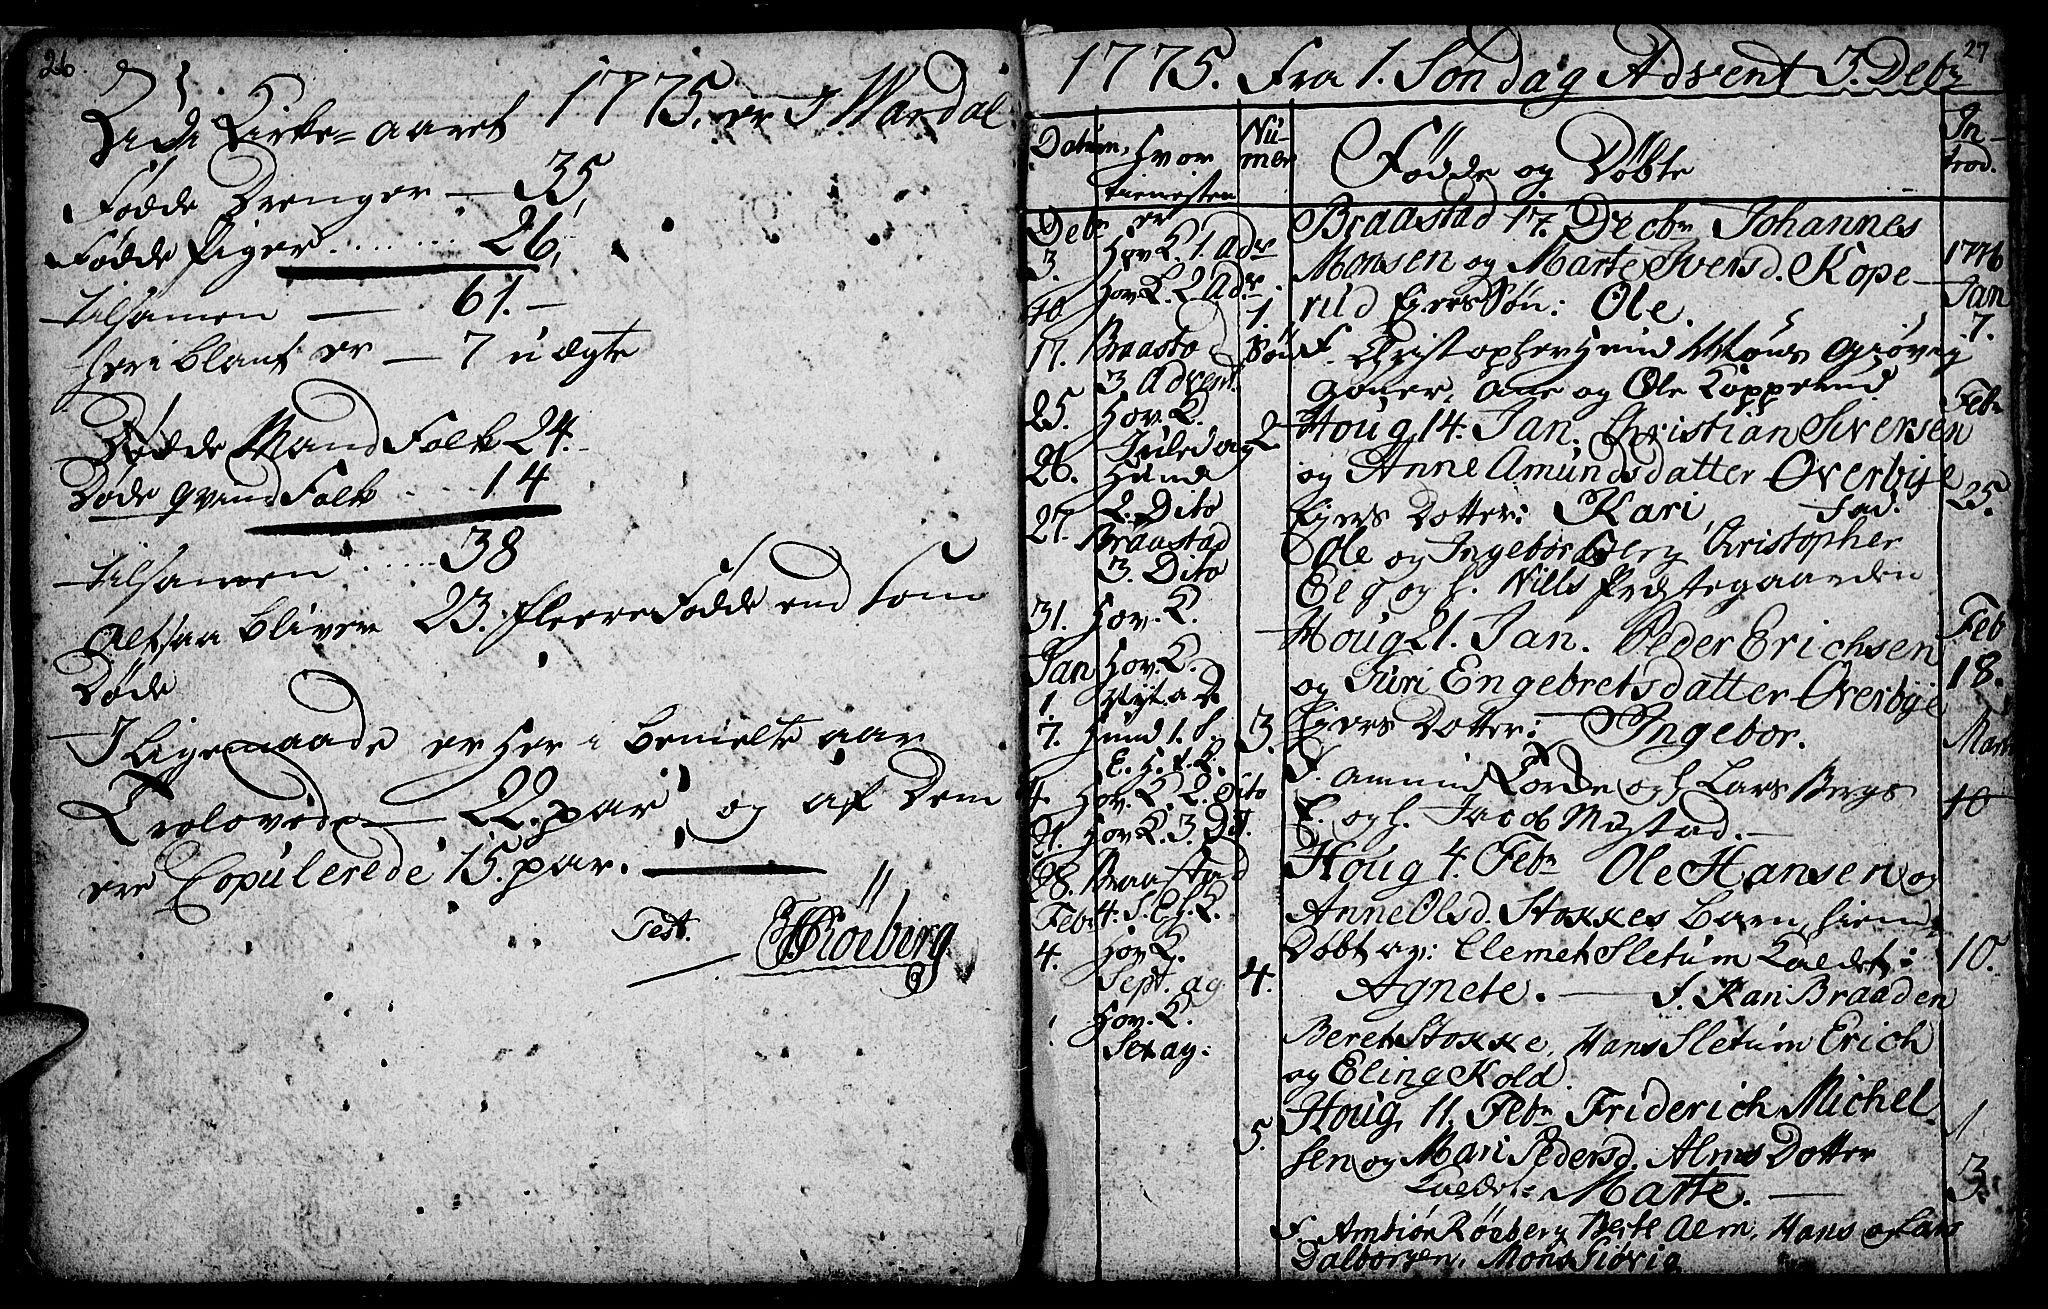 SAH, Vardal prestekontor, H/Ha/Hab/L0001: Klokkerbok nr. 1, 1771-1790, s. 26-27